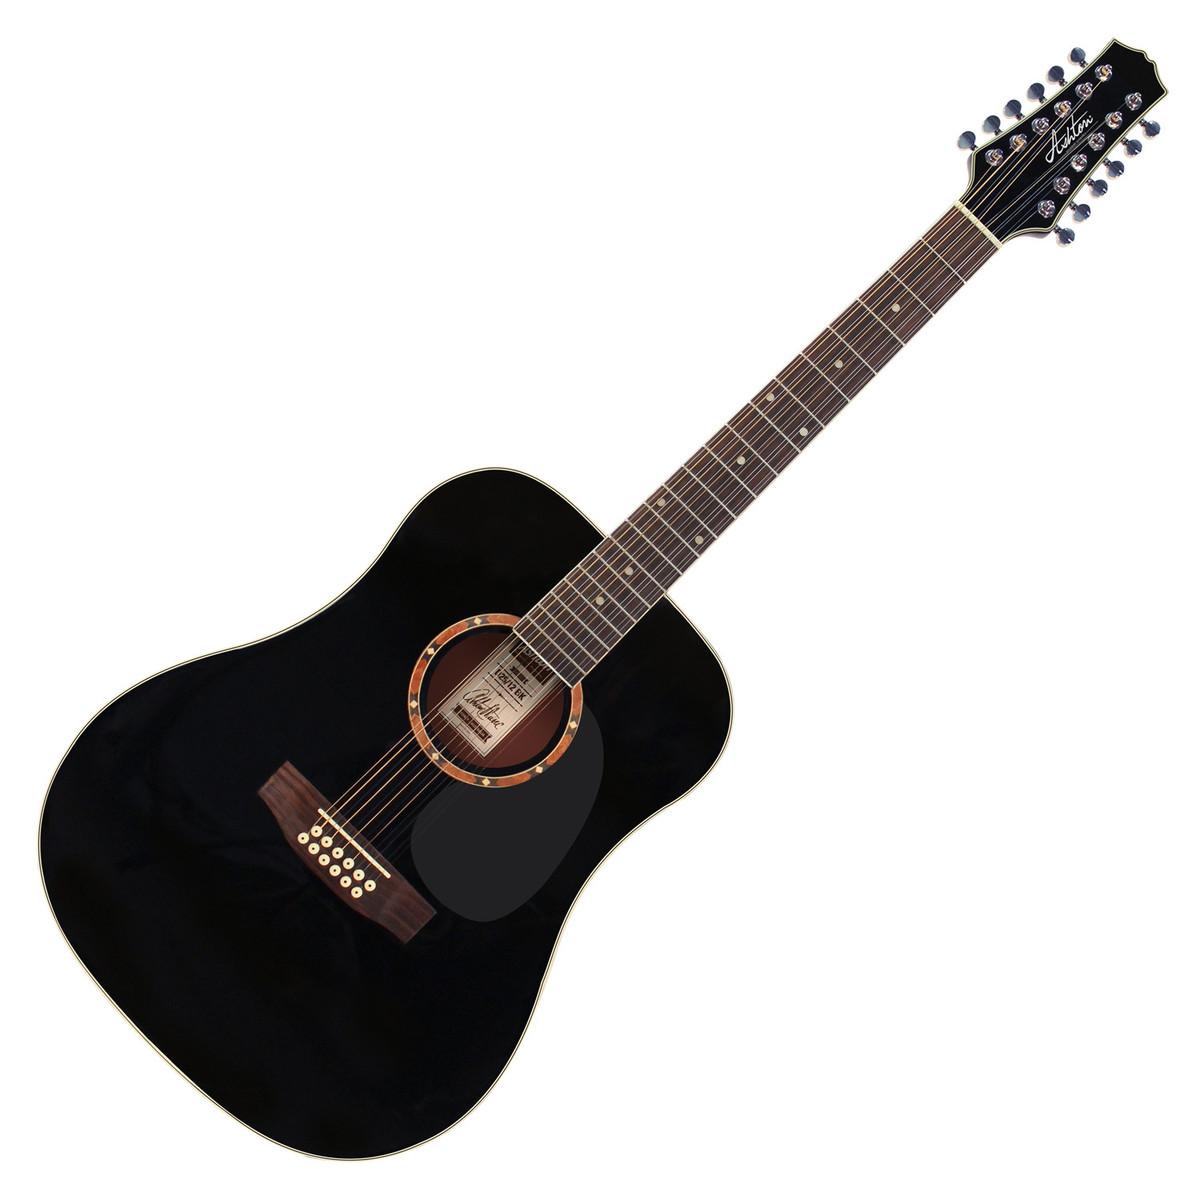 ashton d25 12 dreadnought 12 string acoustic guitar black at gear4music